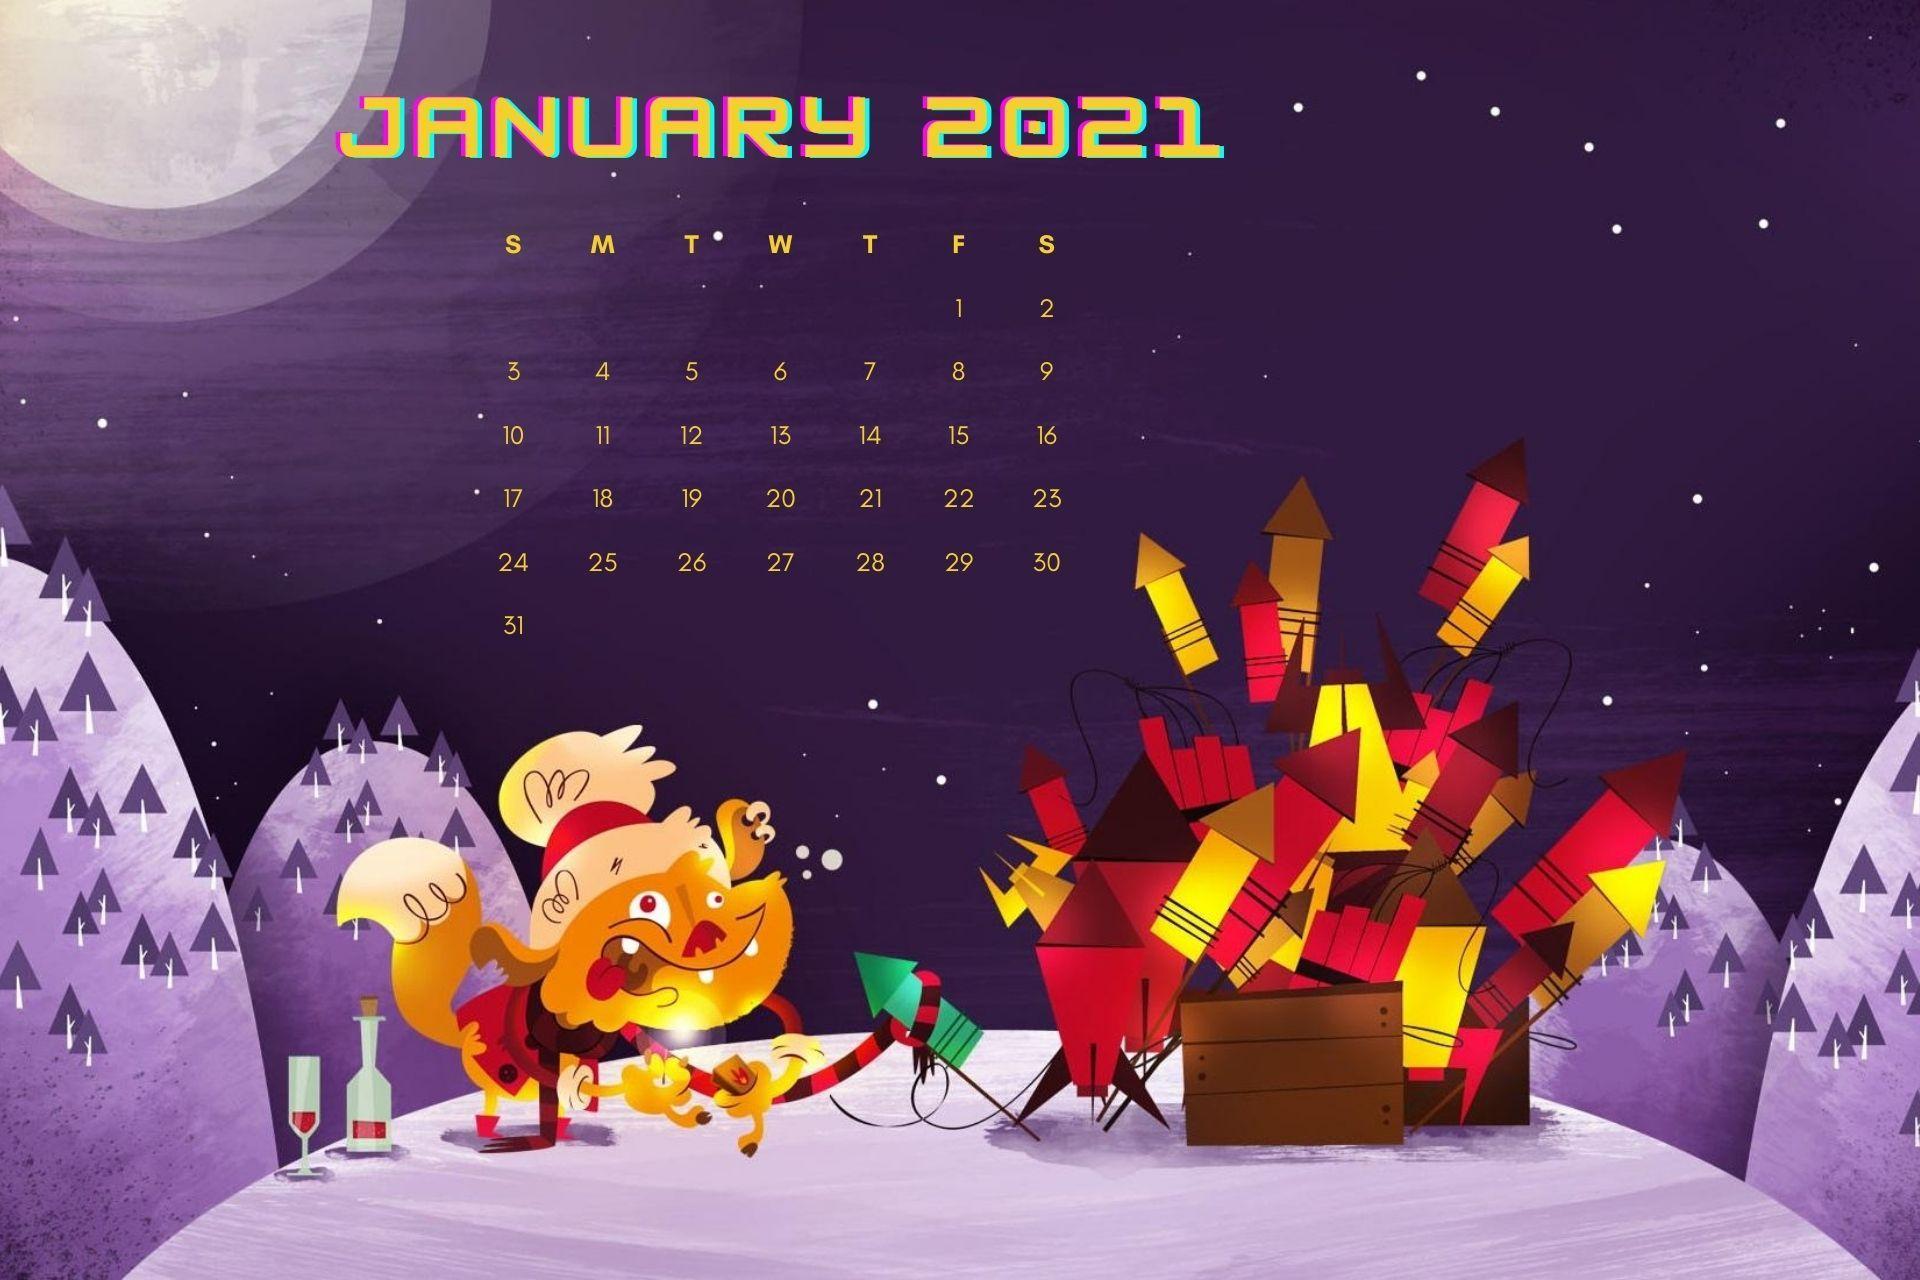 Beautiful January 2021 Calendar Wallpaper For Desktop Calendar Wallpaper Desktop Calendar Free Printable Calendar Templates